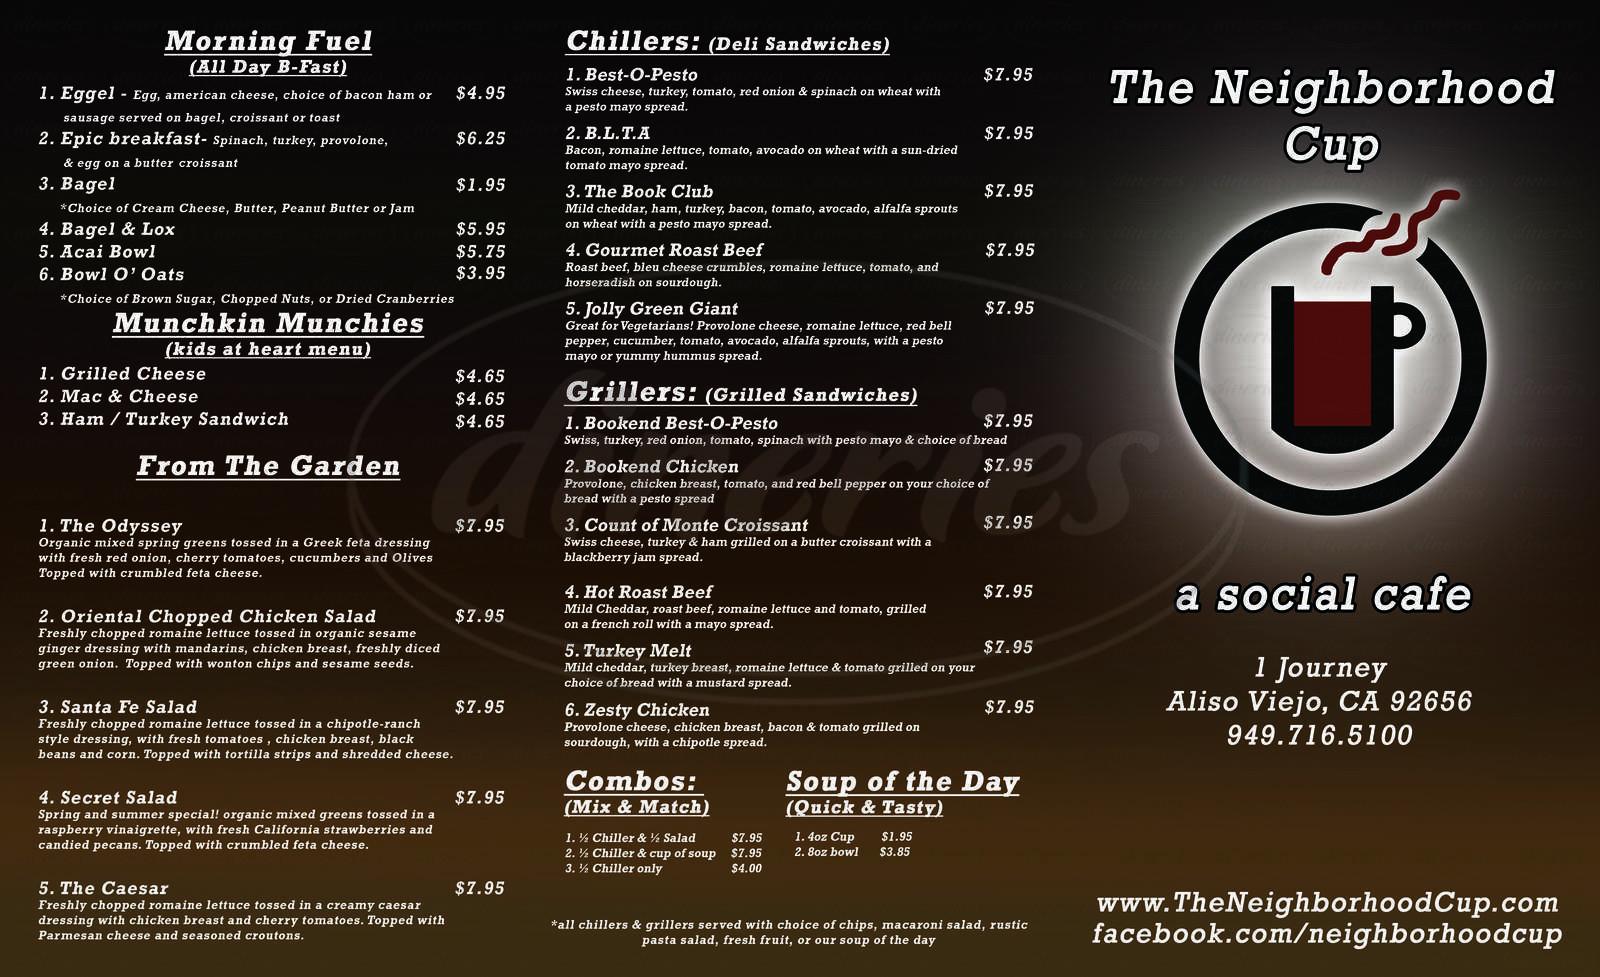 menu for The Neighborhood Cup